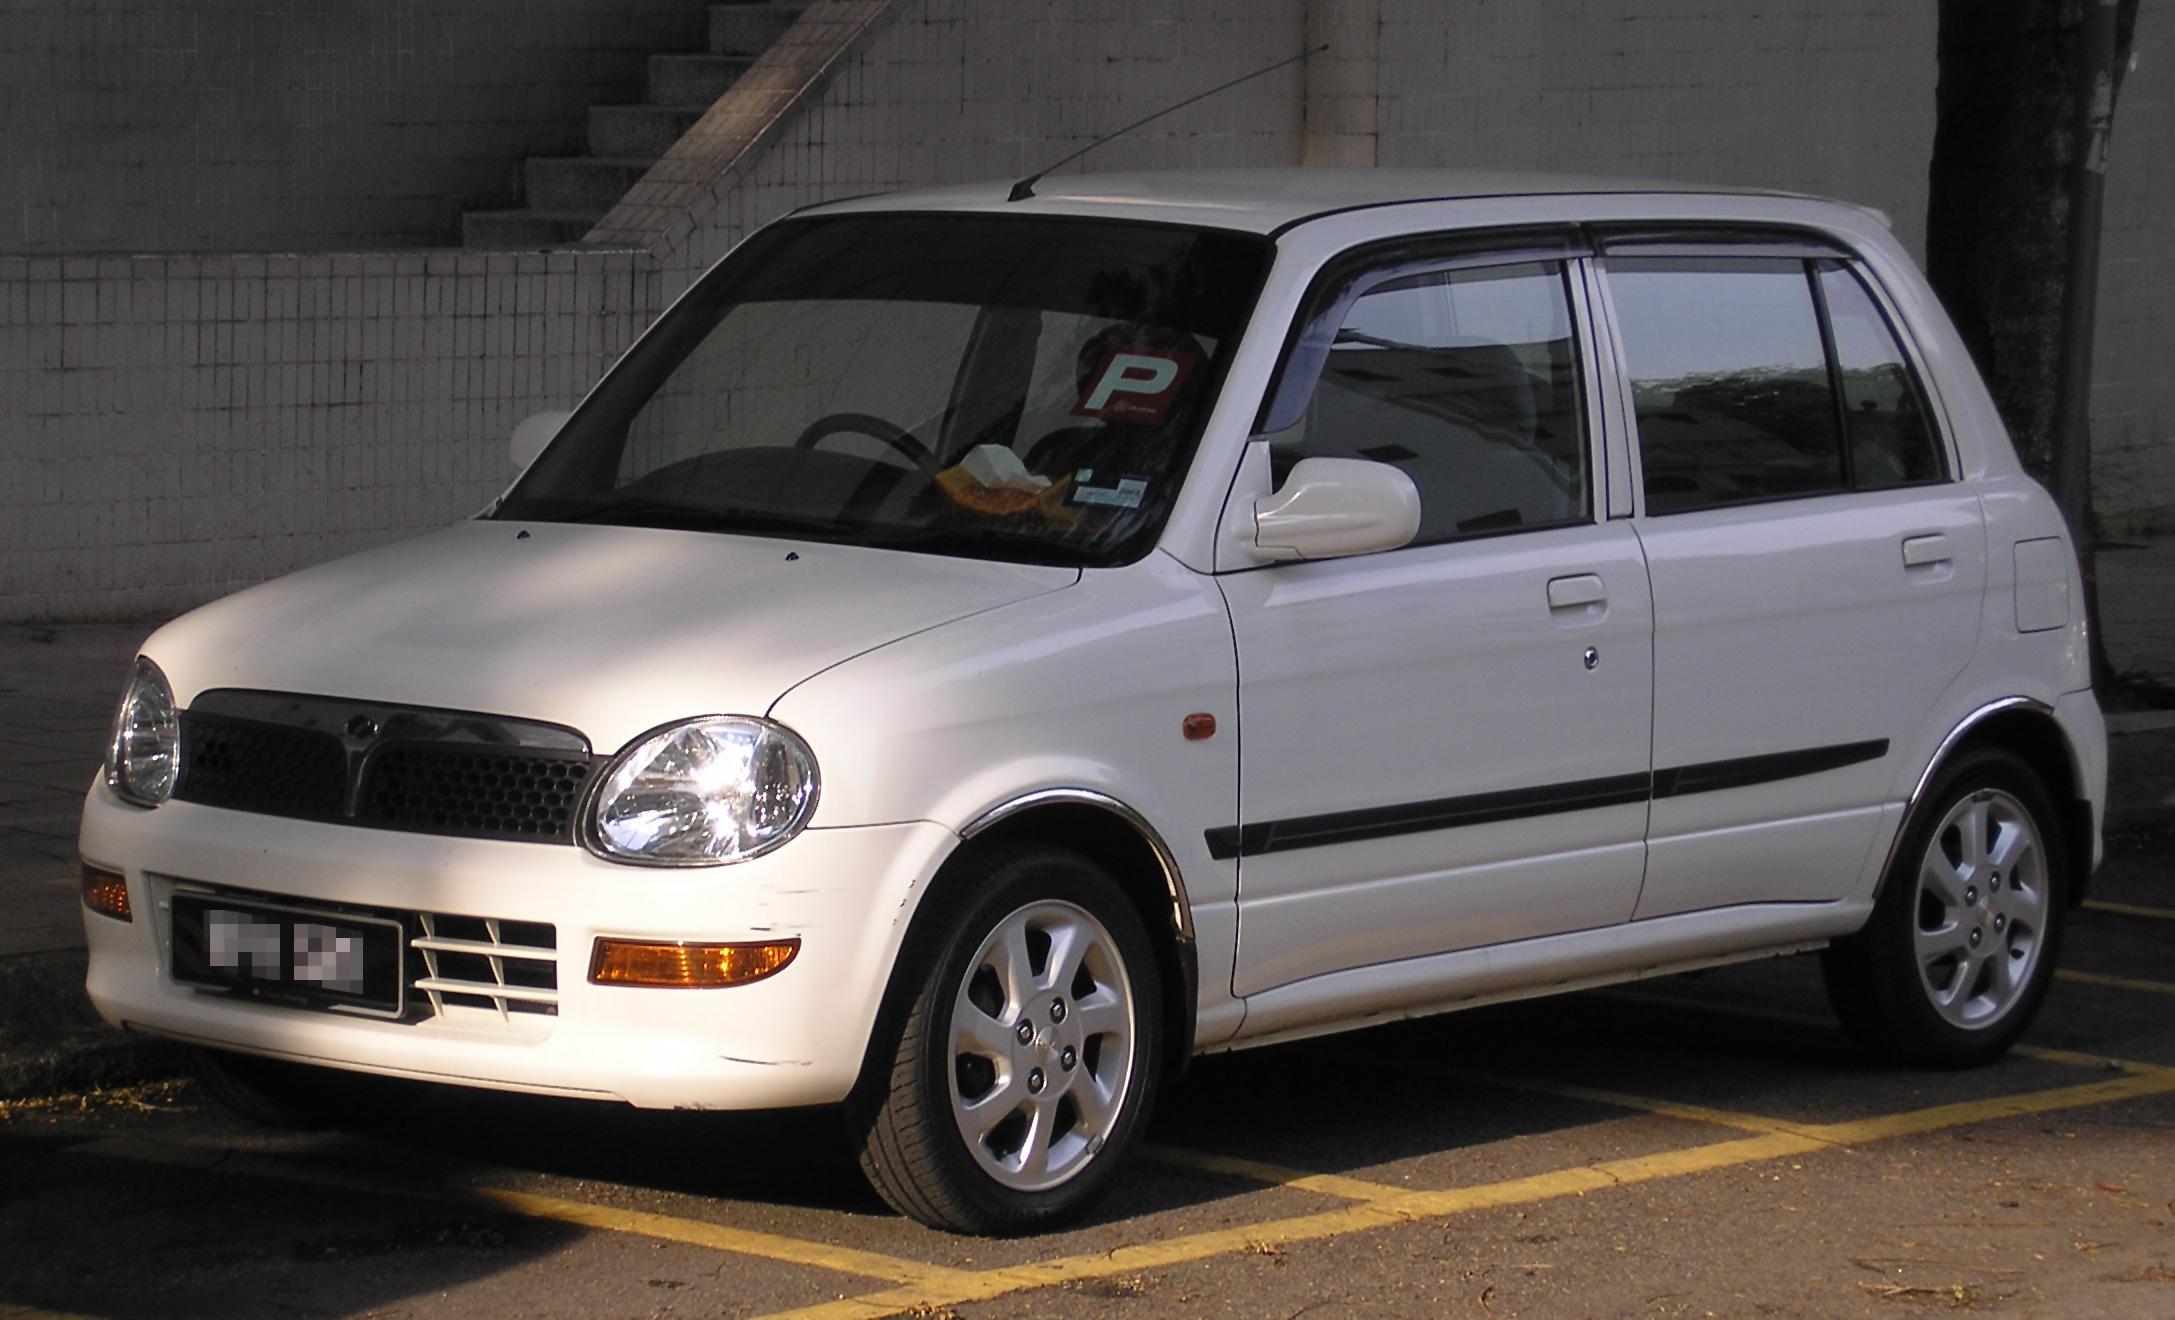 File:Perodua Kelisa (first facelift) (front), Kuala Lumpur